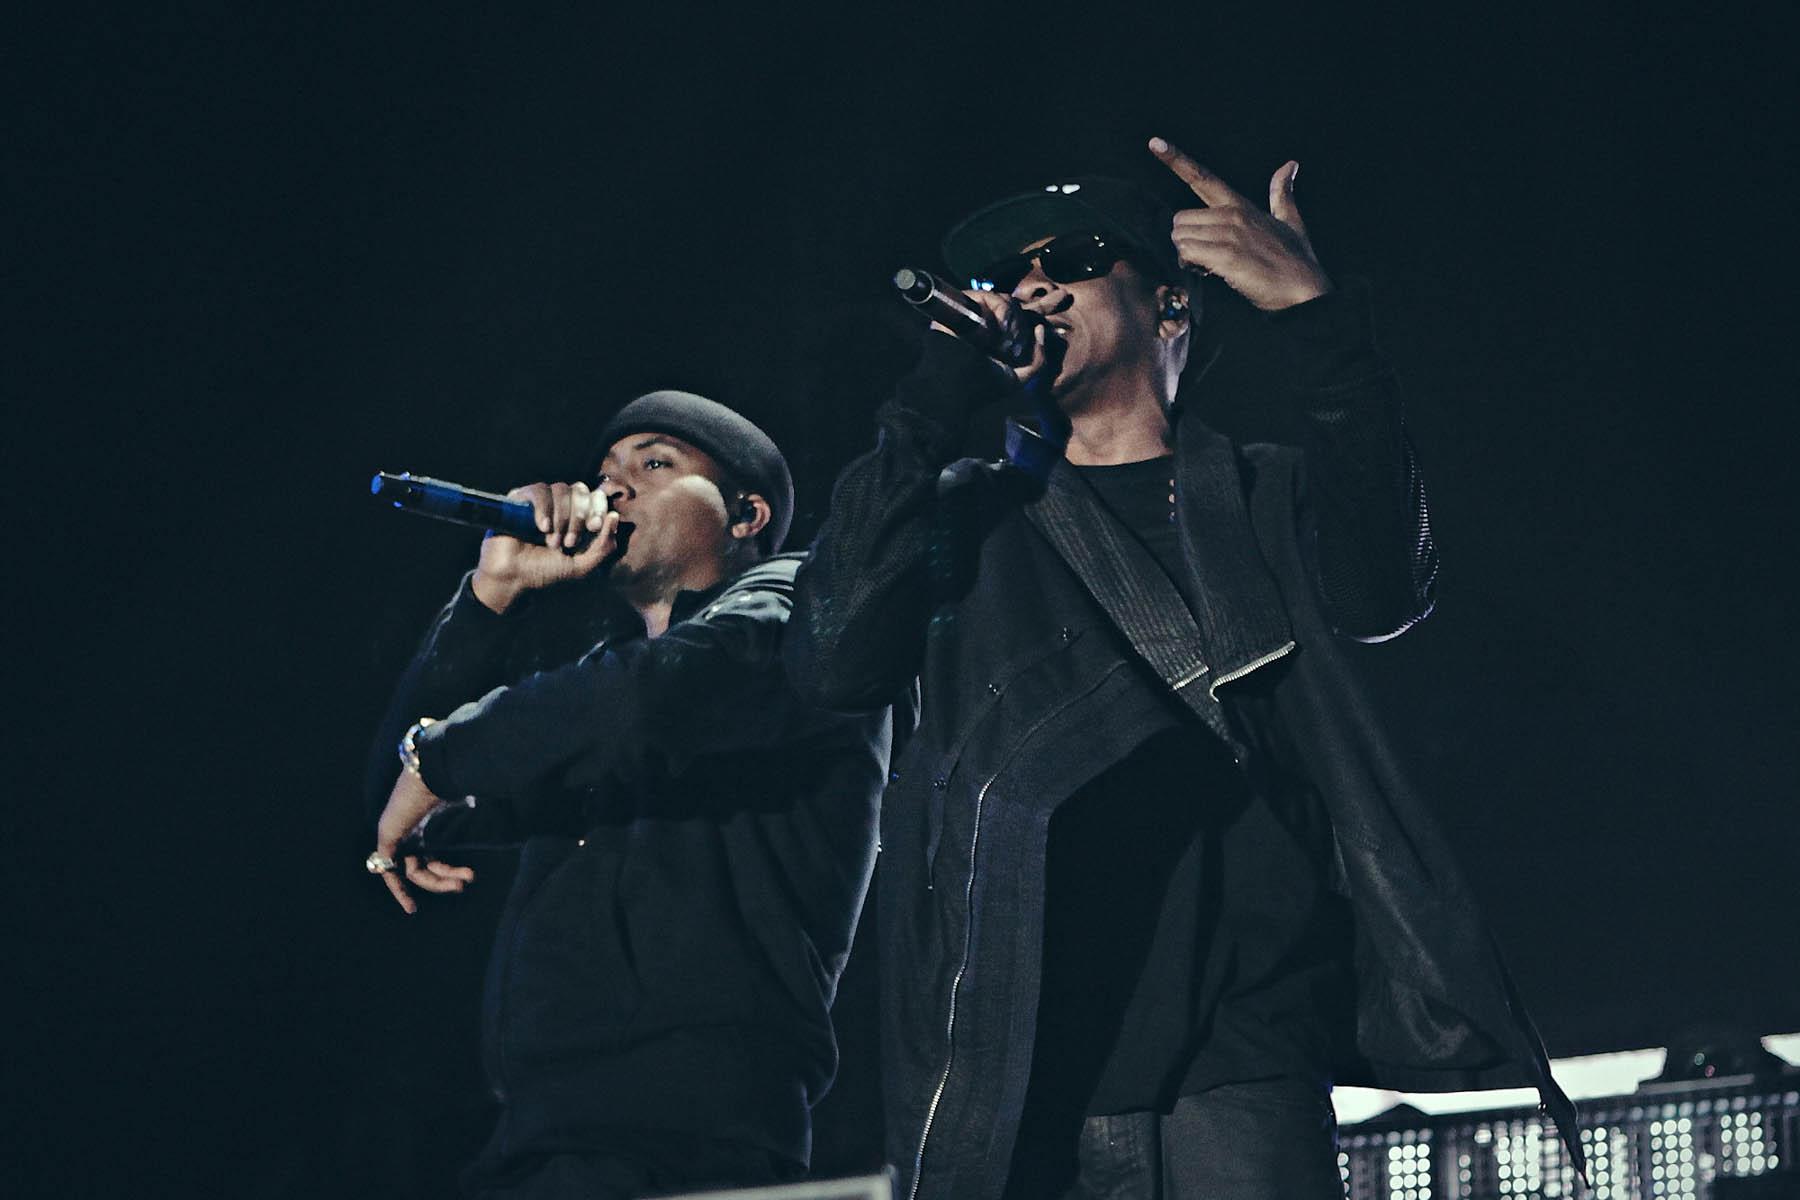 Jay Z, Gwen Stefani, Beyonce Cameo on All-Star Saturday at Coachella